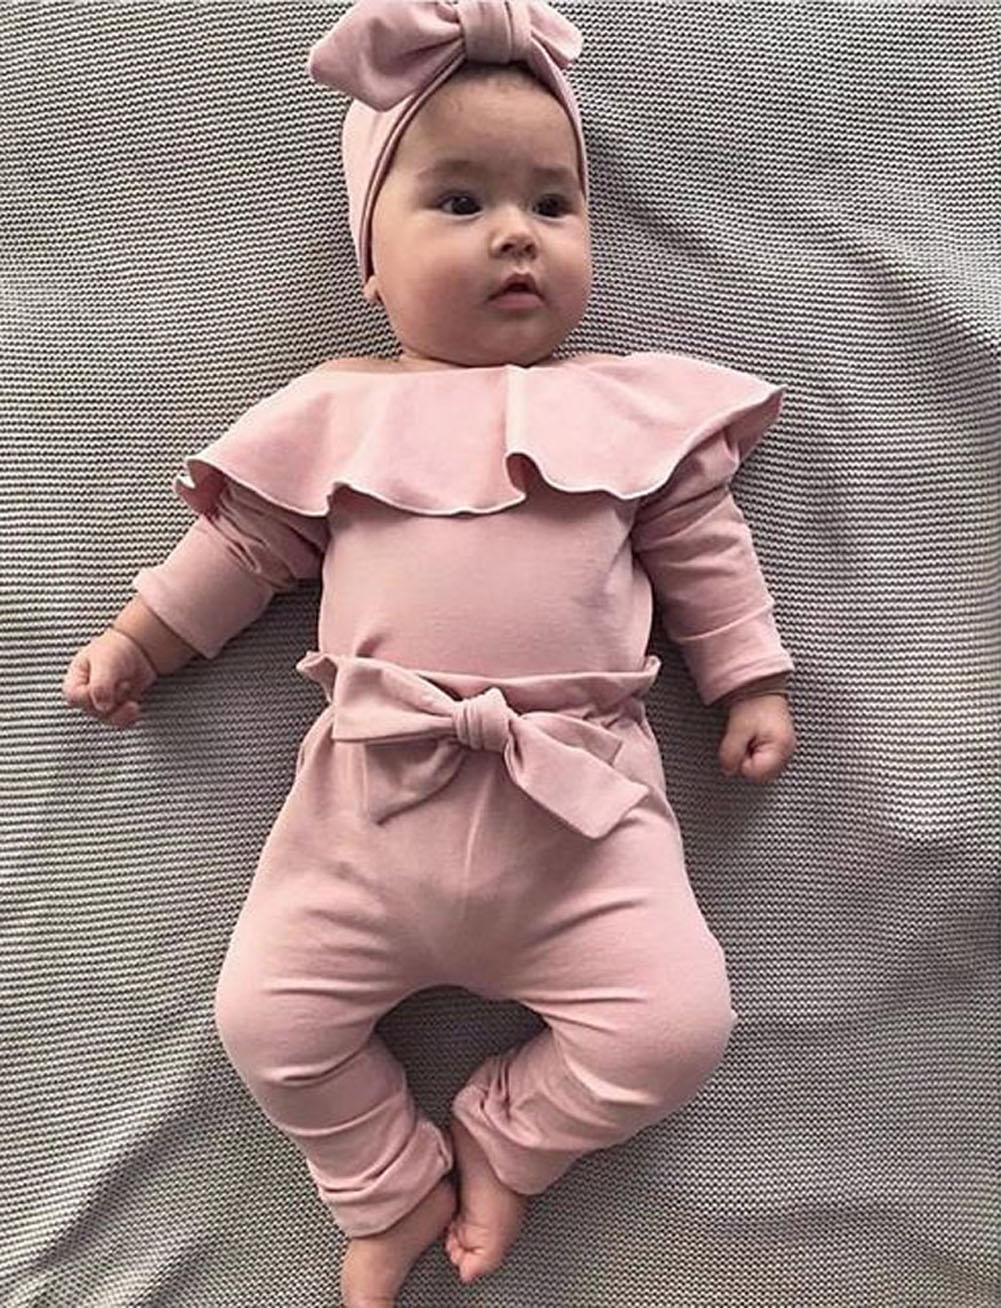 ><font><b>2PCS</b></font> <font><b>Toddler</b></font> <font><b>Kids</b></font> Baby Girls Ruffle Bodysuit 2020 Baby Romper Pink Tops Bowknot PP Pants Winter Outfits Clothes